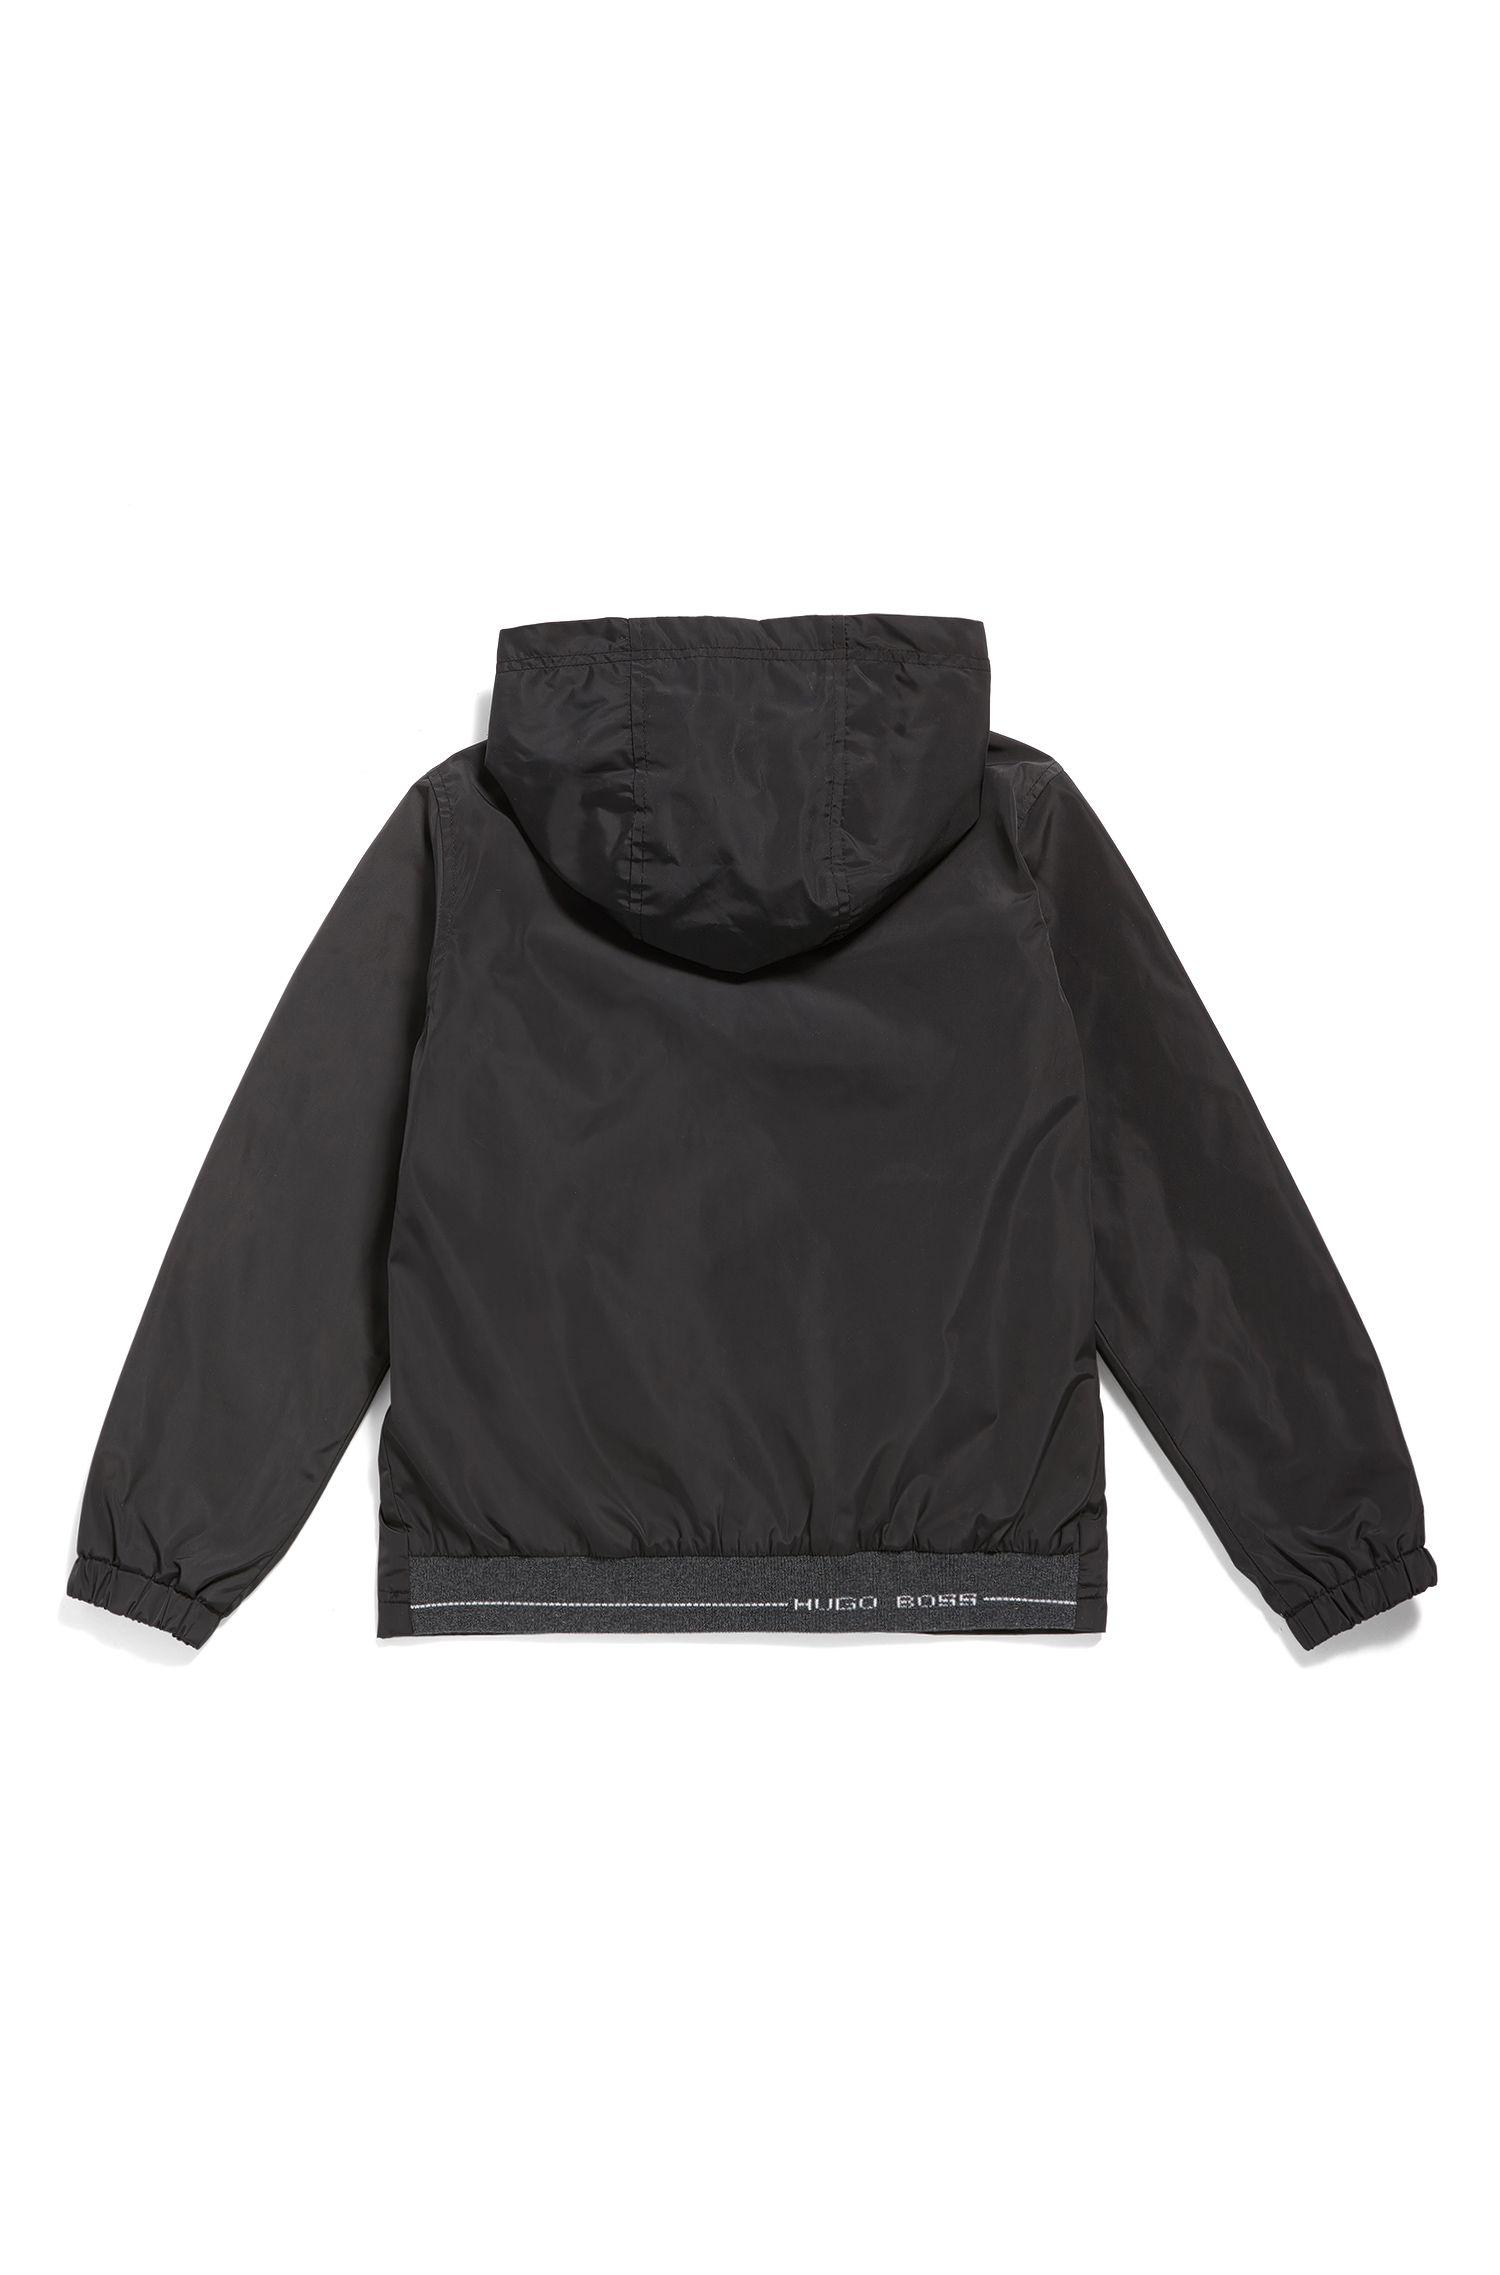 Veste Regular Fit pour enfant en tissu indéchirable